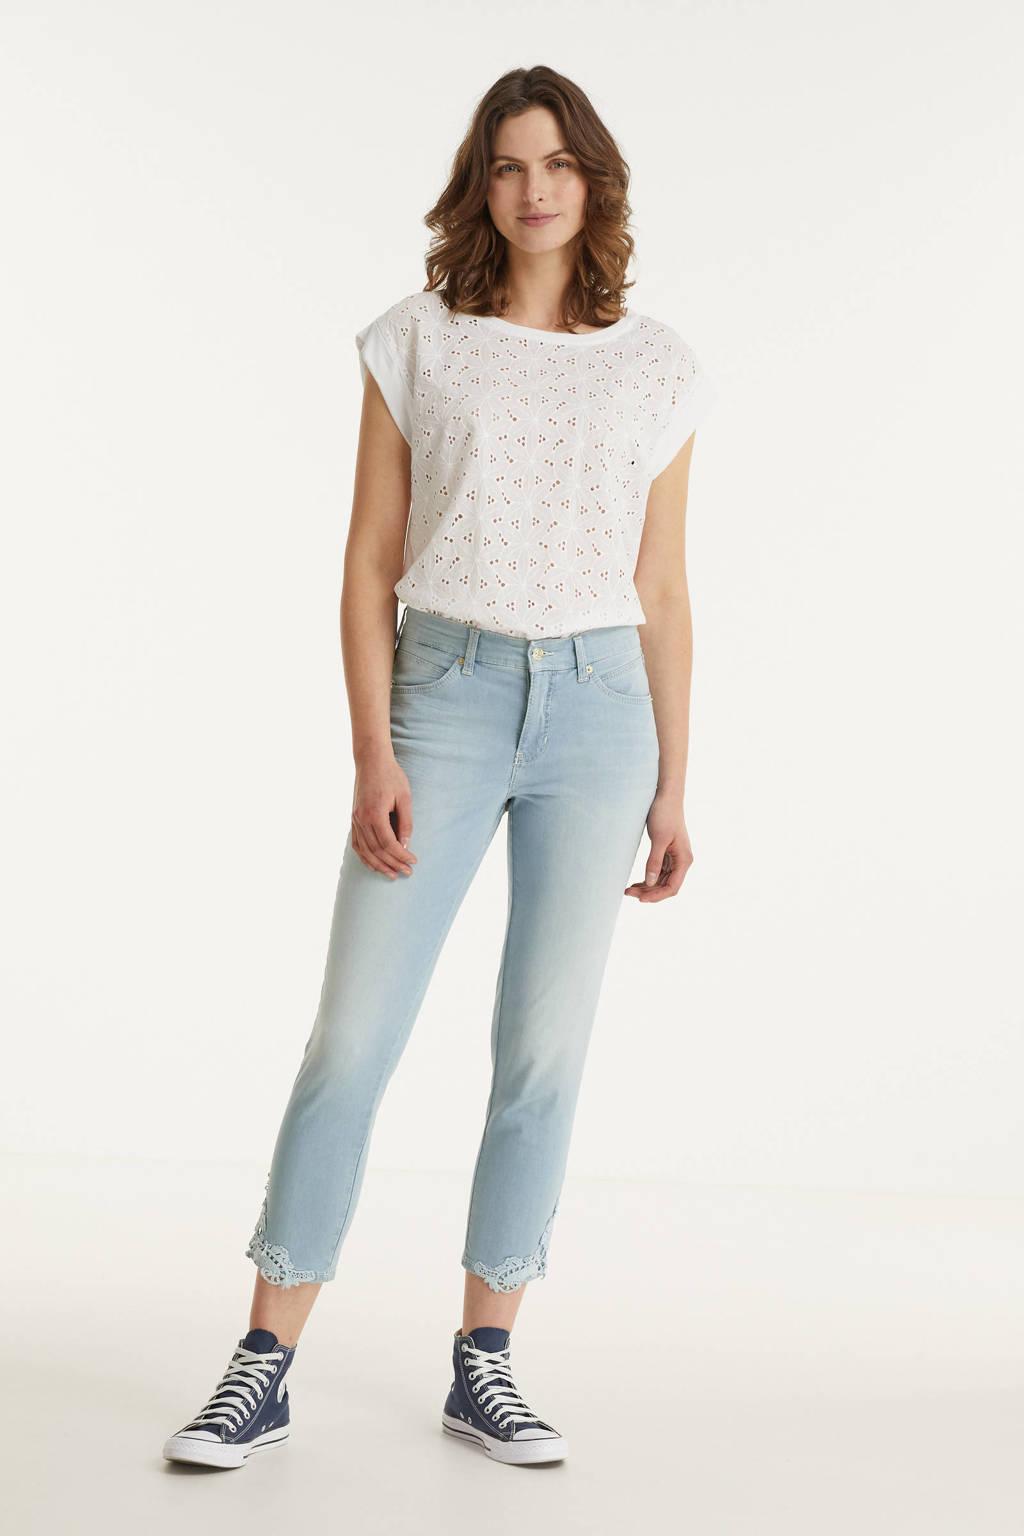 MAC straight fit jeans Melanie Lace 7/8 d225 light summer wash, D225 light summer wash